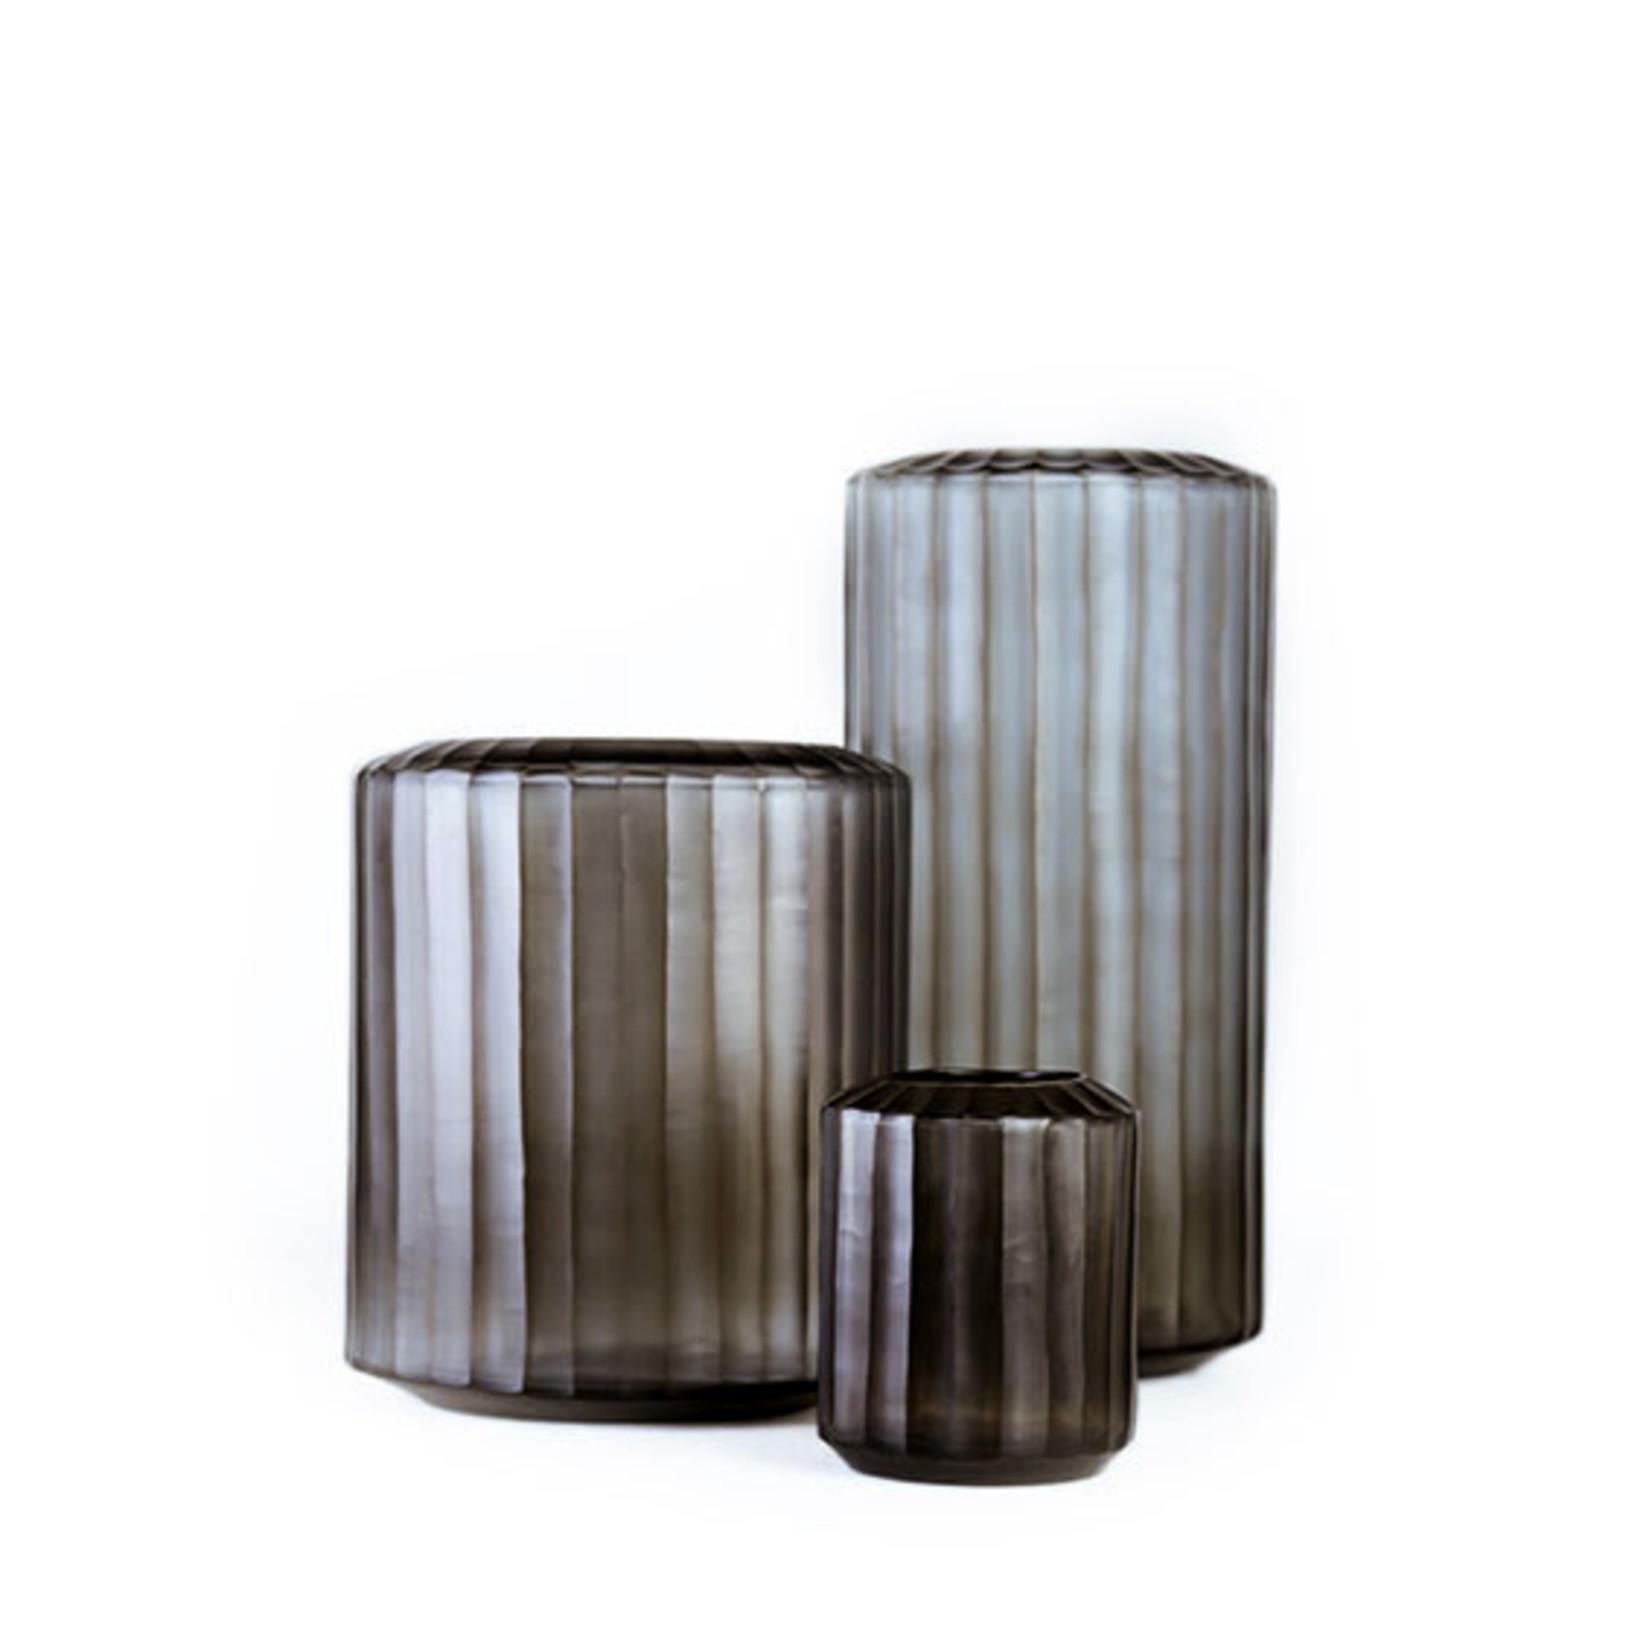 Guaxs Vase Omar S | Indigo / Smoke Gray